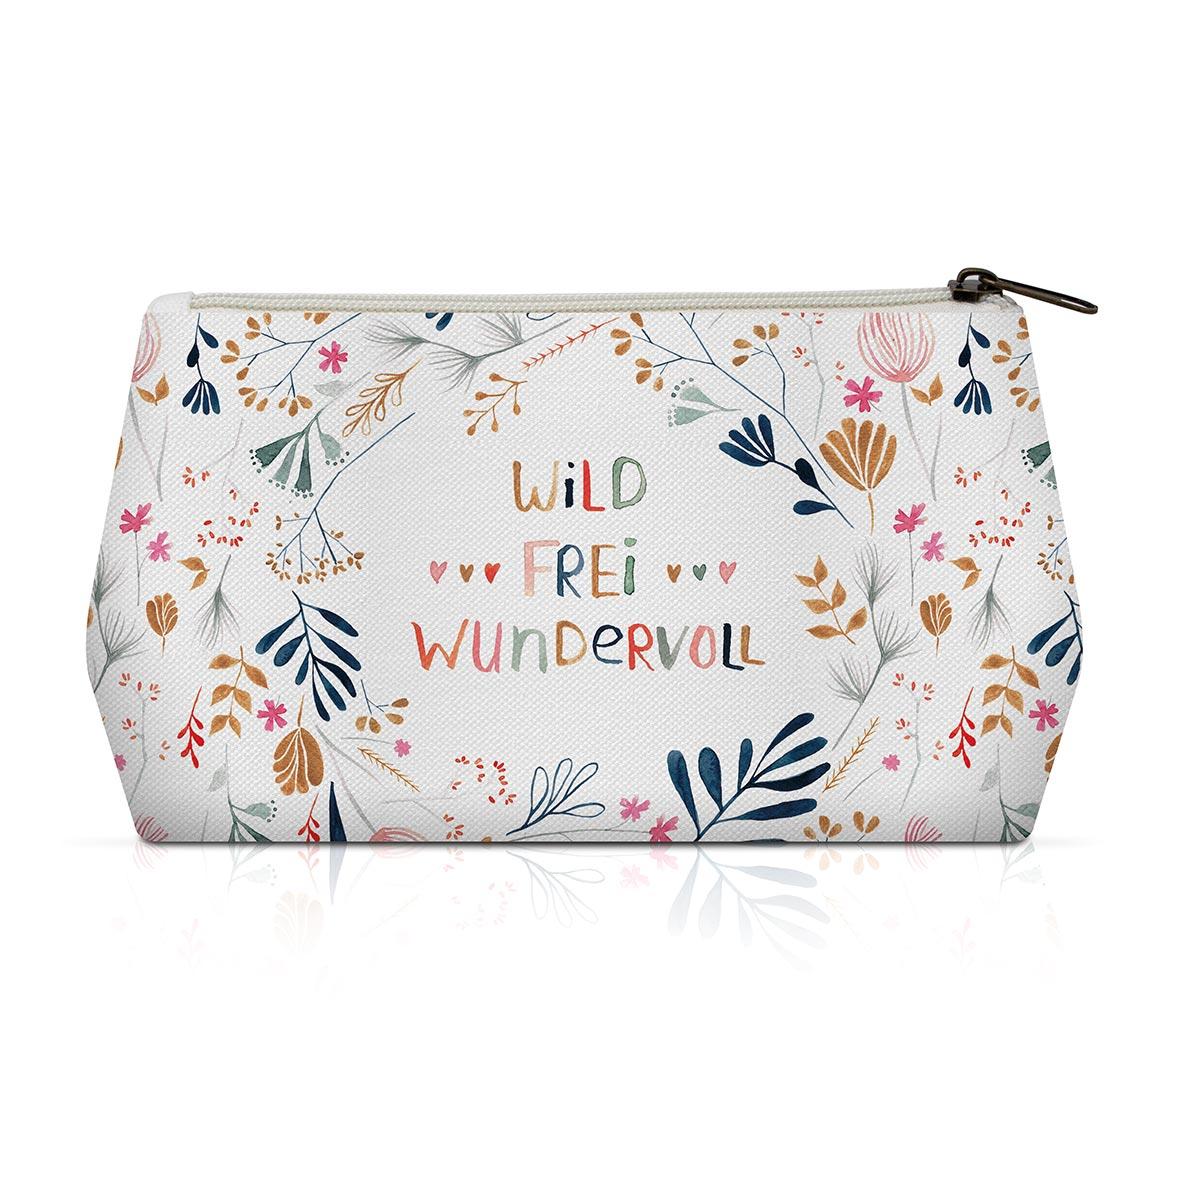 Wild, Frei, Wundervoll Cosmetic Bag